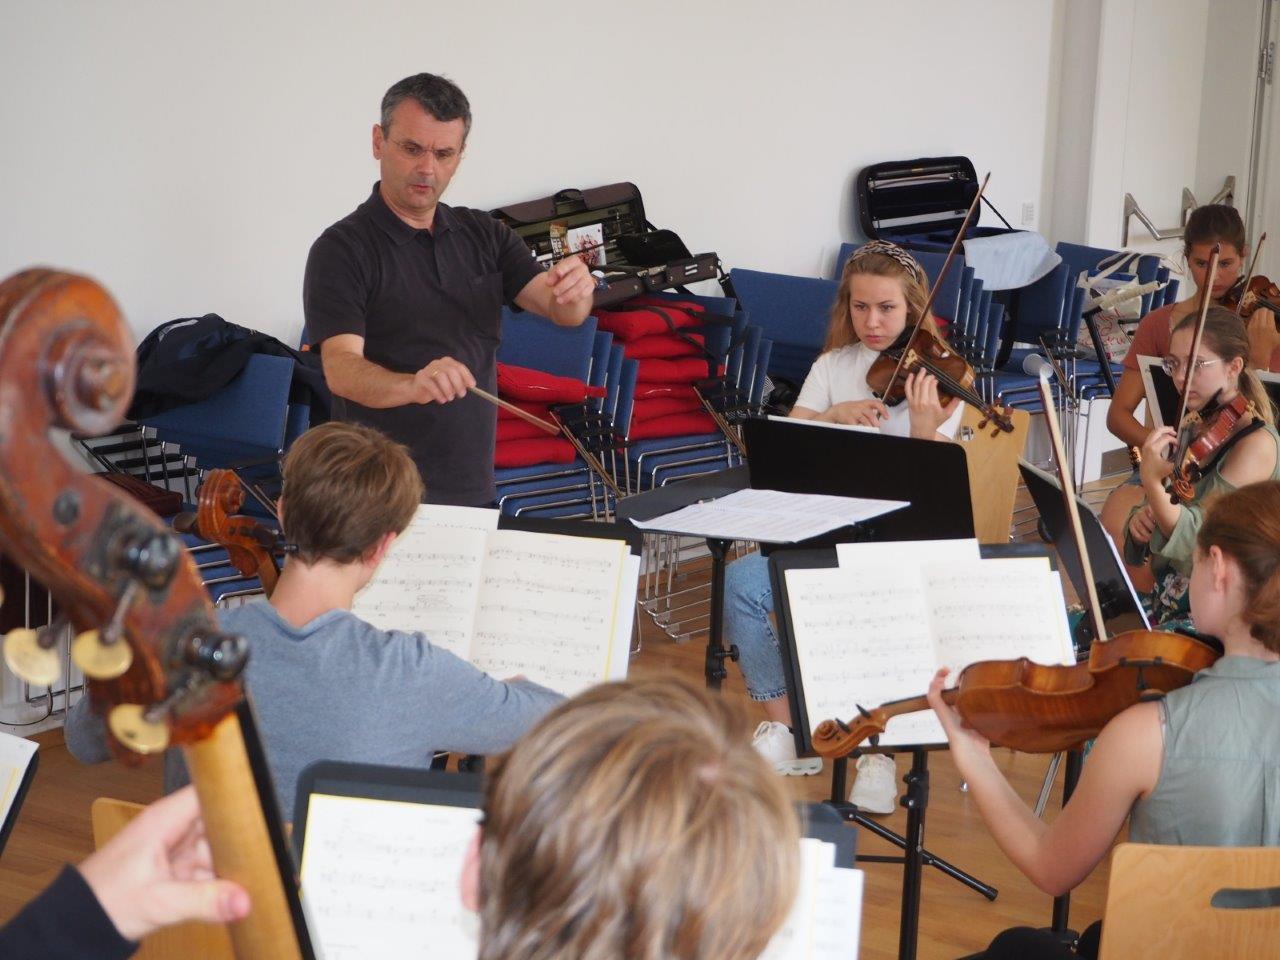 Kooperation mit Wiener Philharmonikern 2021